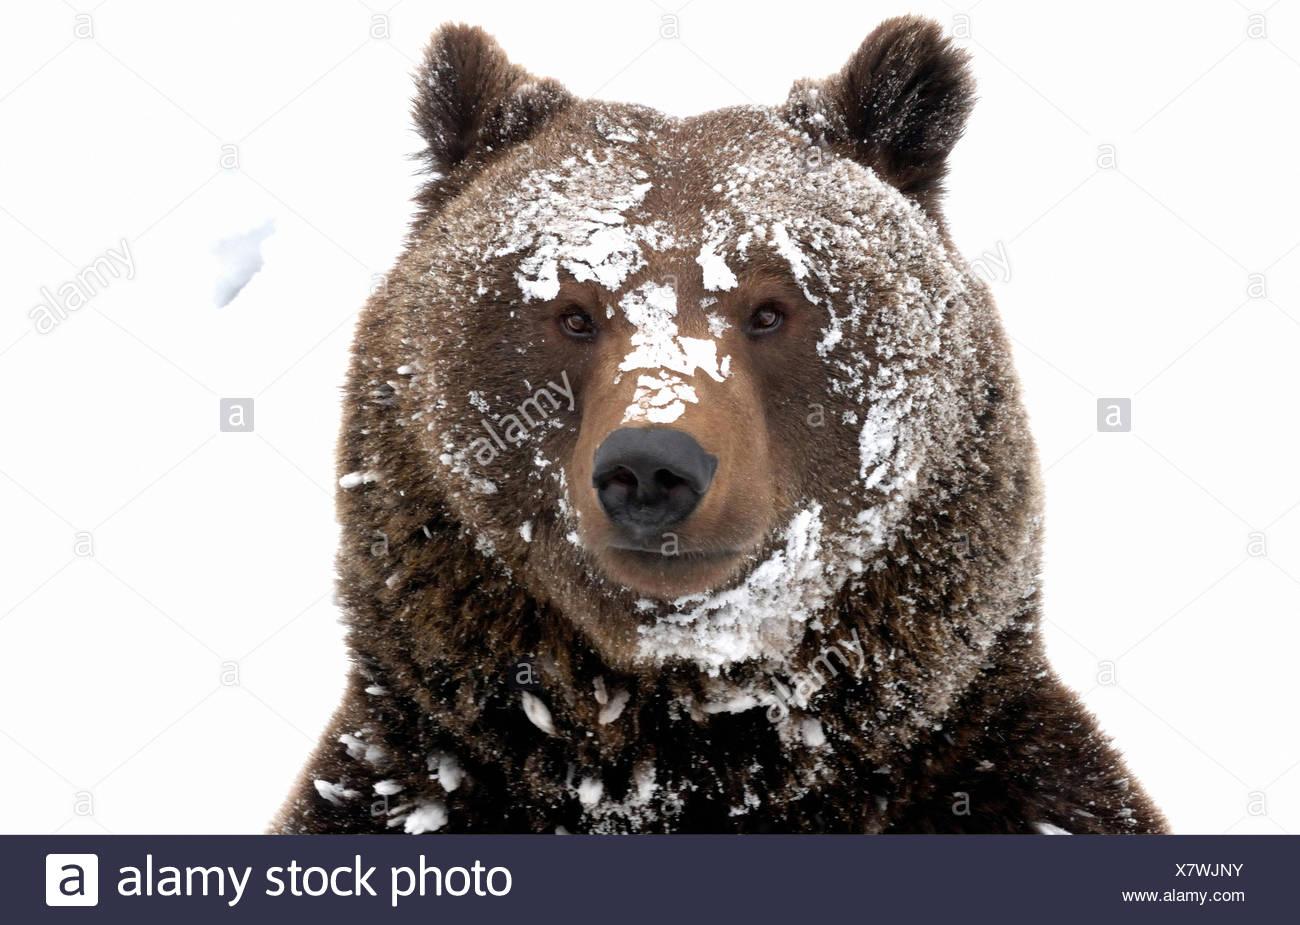 winter bear stock photos winter bear stock images alamy. Black Bedroom Furniture Sets. Home Design Ideas